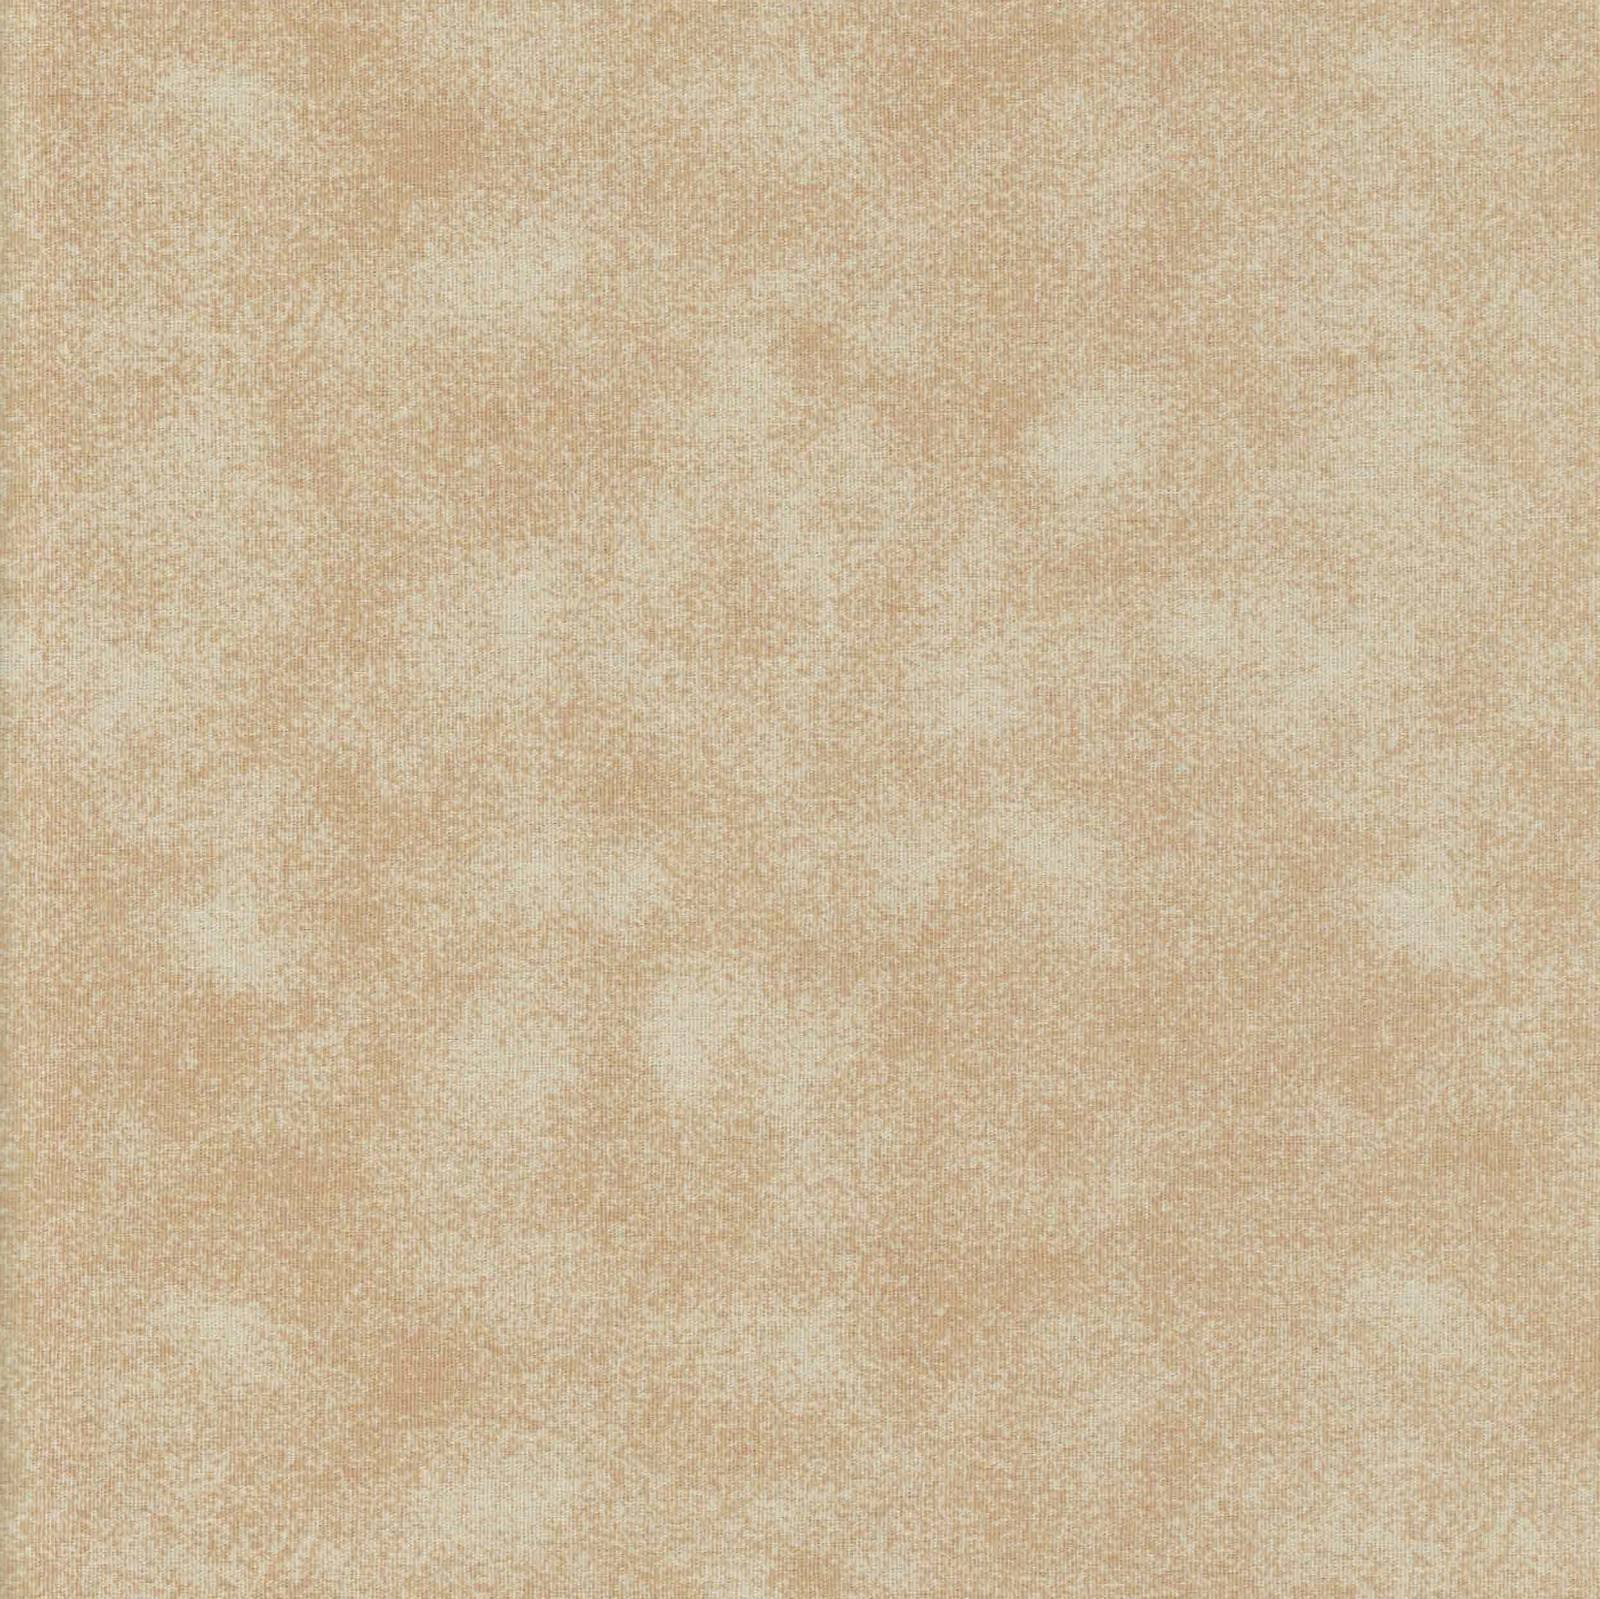 Poeira Ocre Claro Ref. 1131 cor 01 Peripan - Armarinhos Nodari